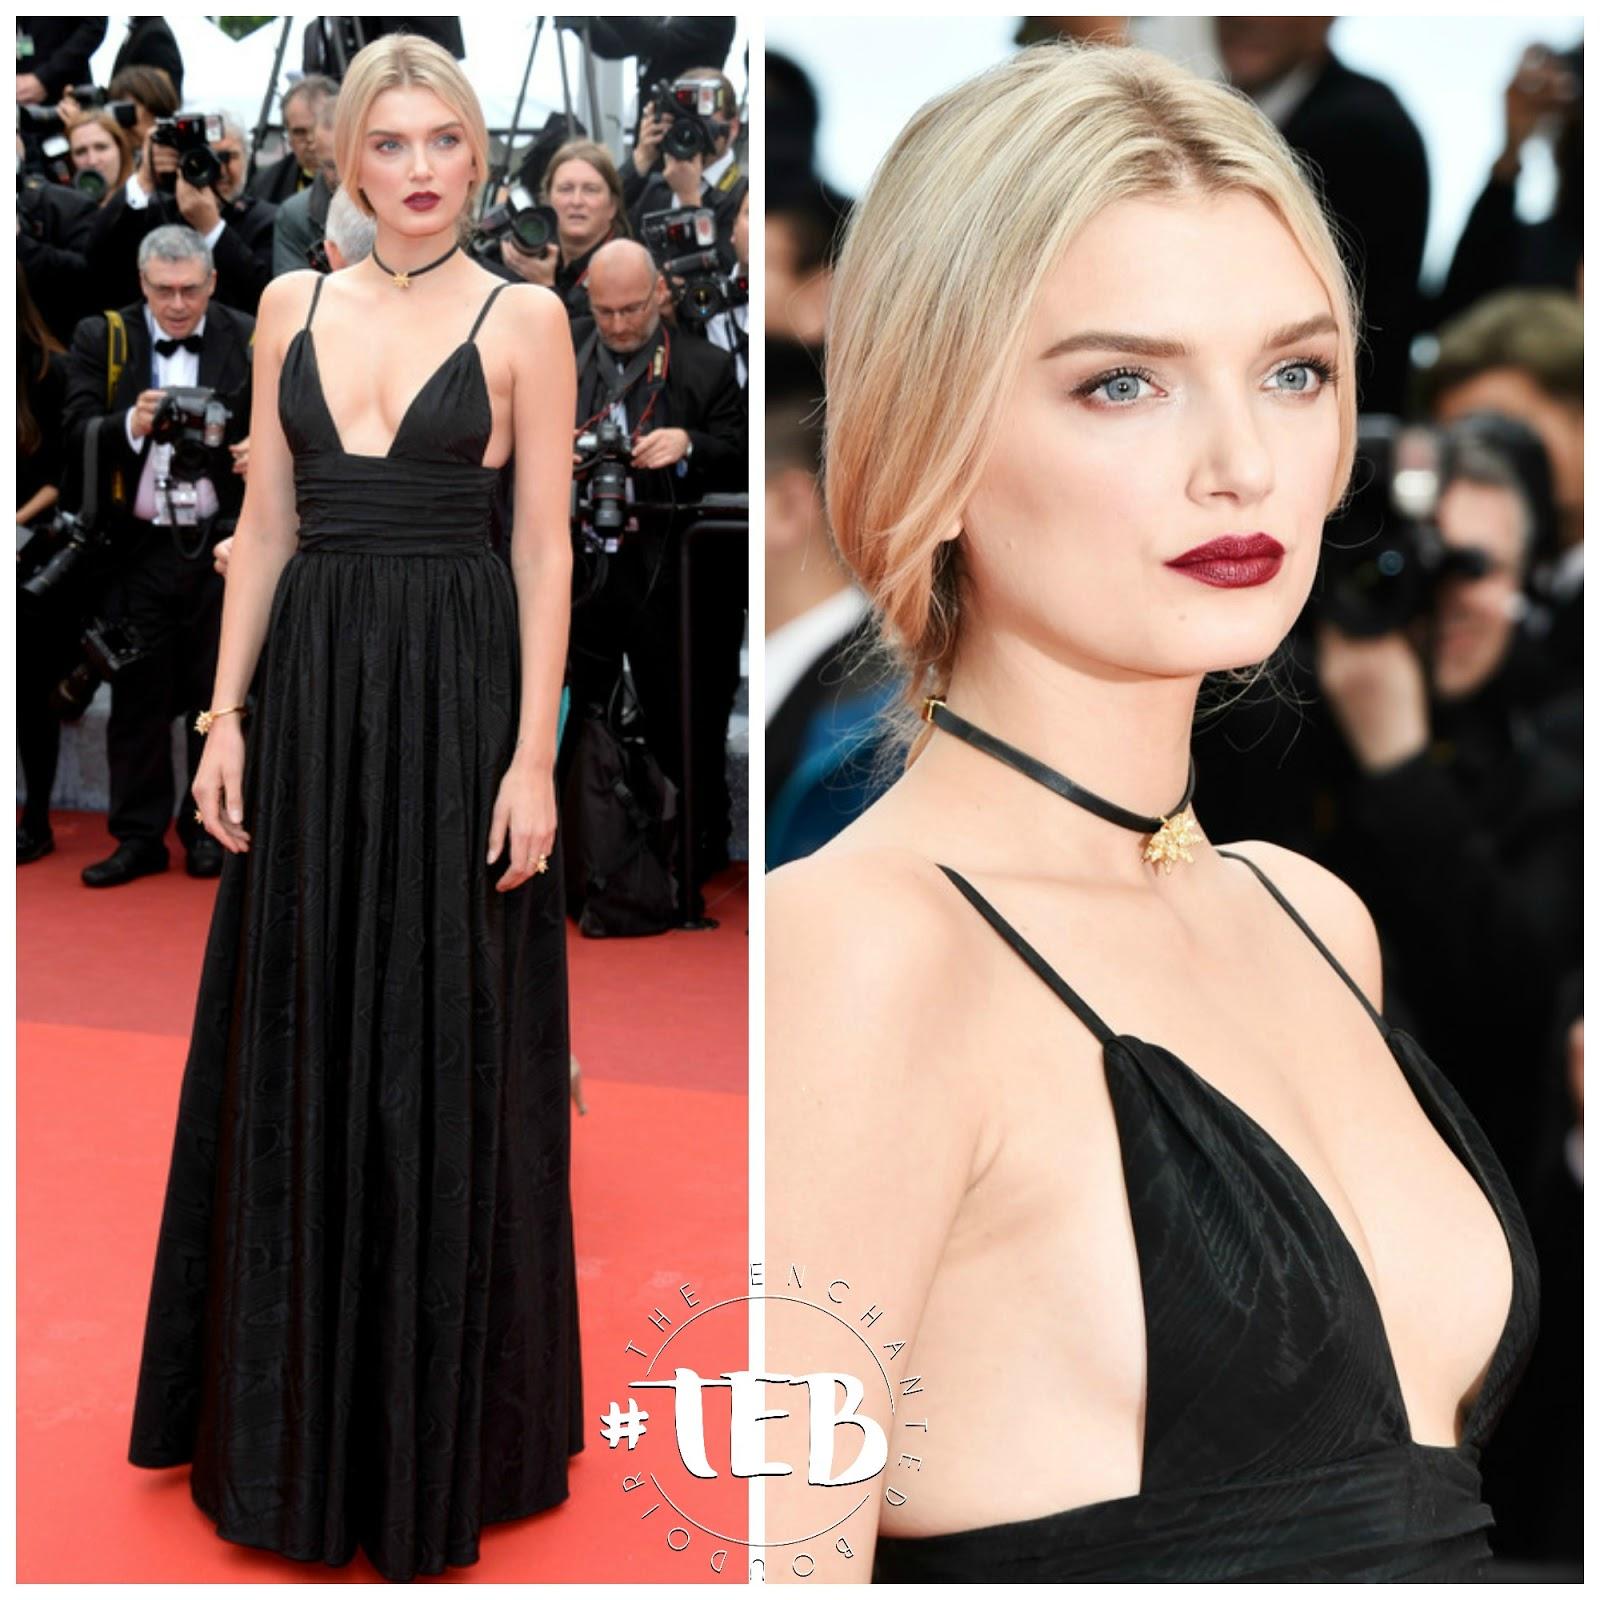 Lily_Donaldson_Cannes_2016_Miu_Miu